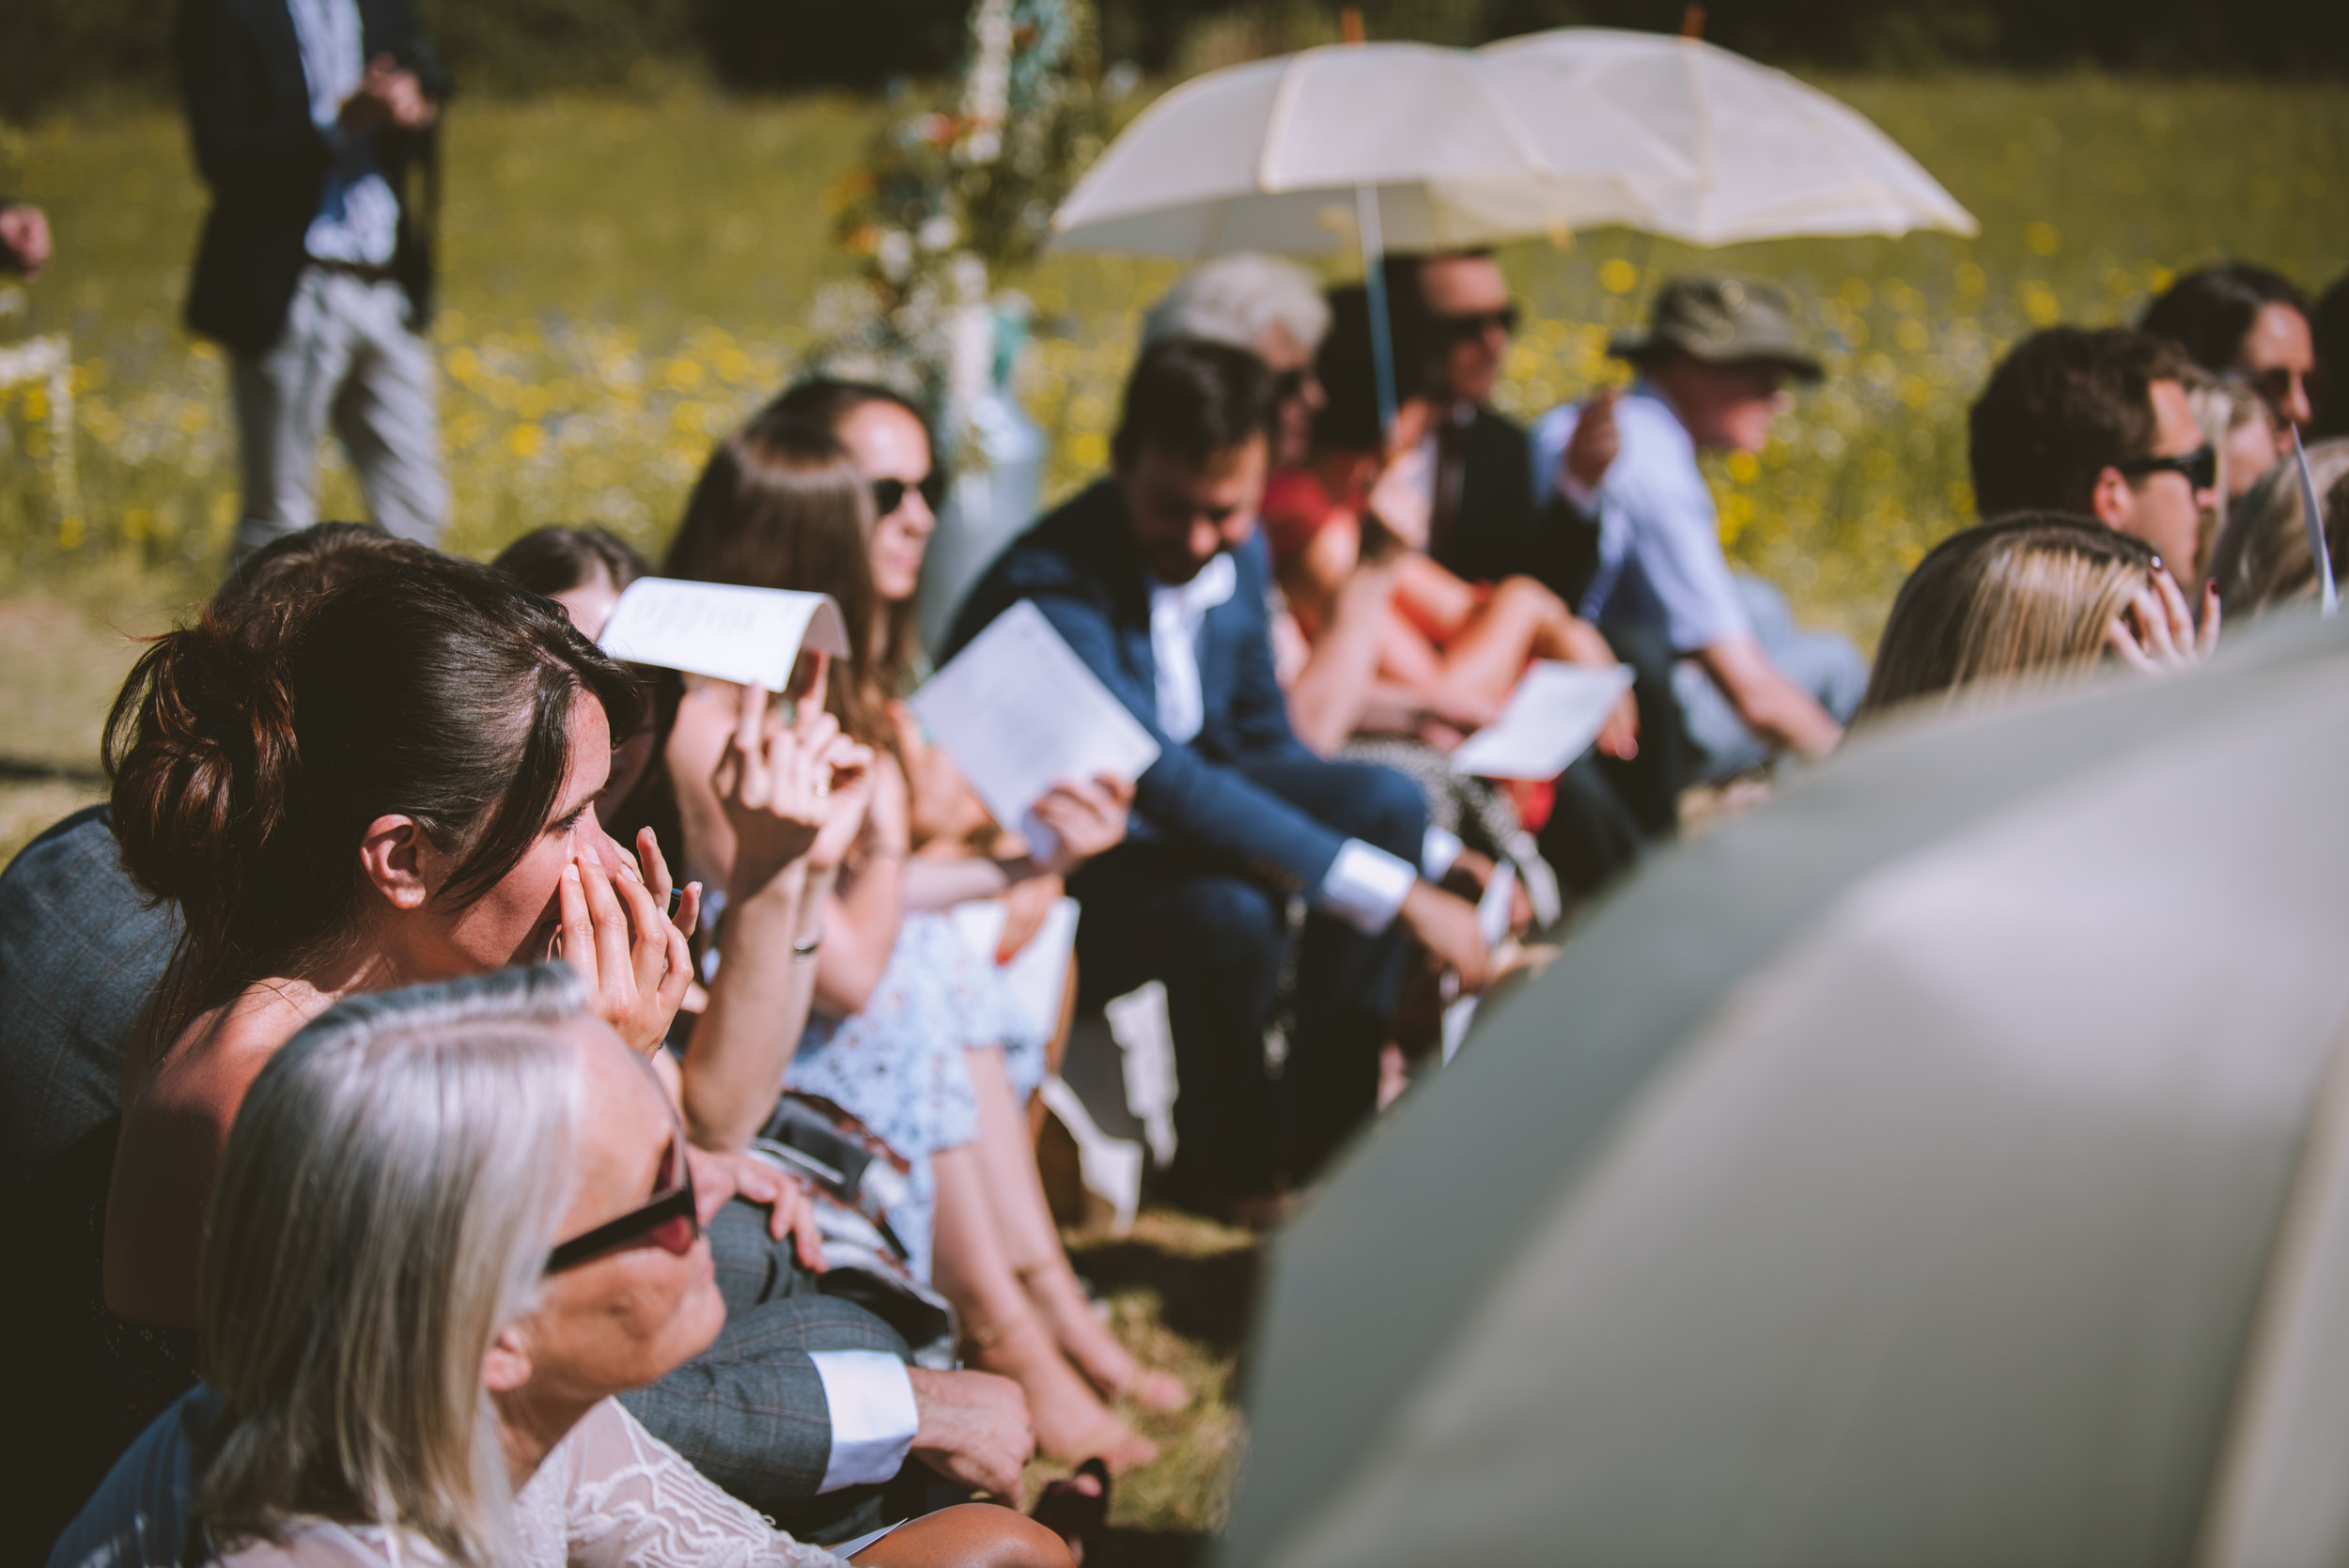 ash-barton-estate-wedding-photographer-mark-shaw-29.jpg